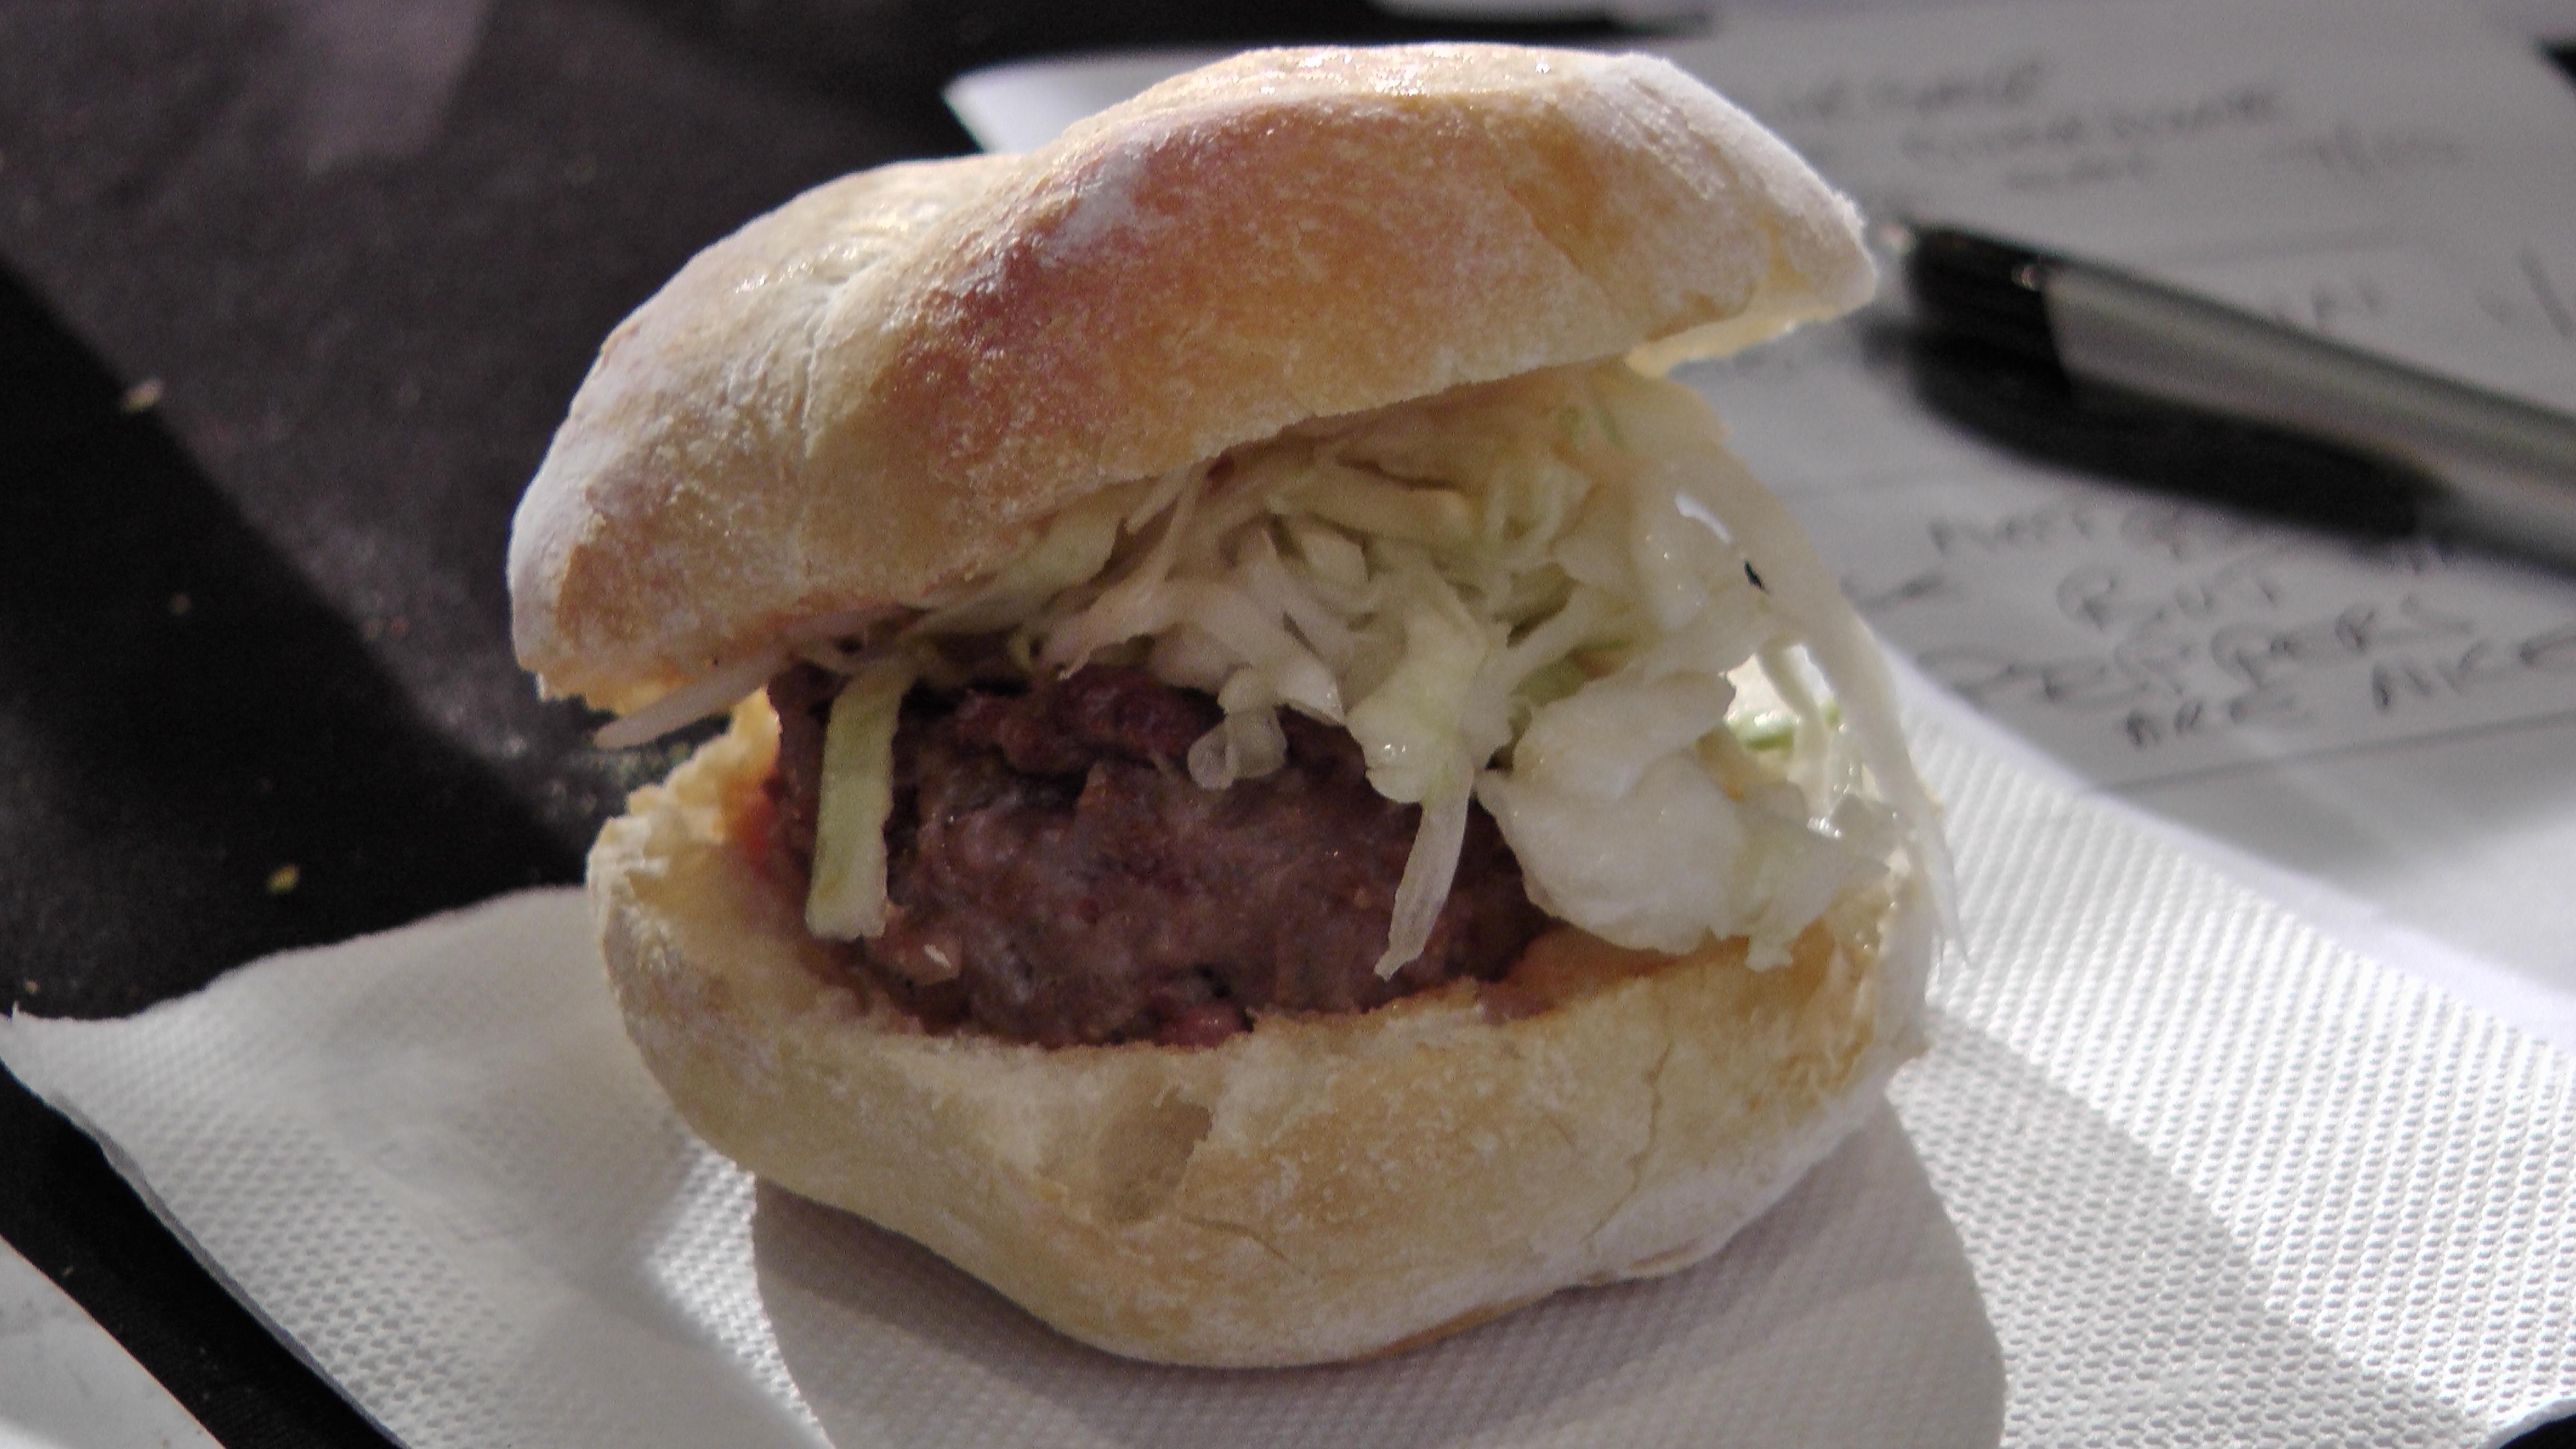 Fom Café Ferreira: A spicy three meat burger with Serra cheese on a Portuguese bun